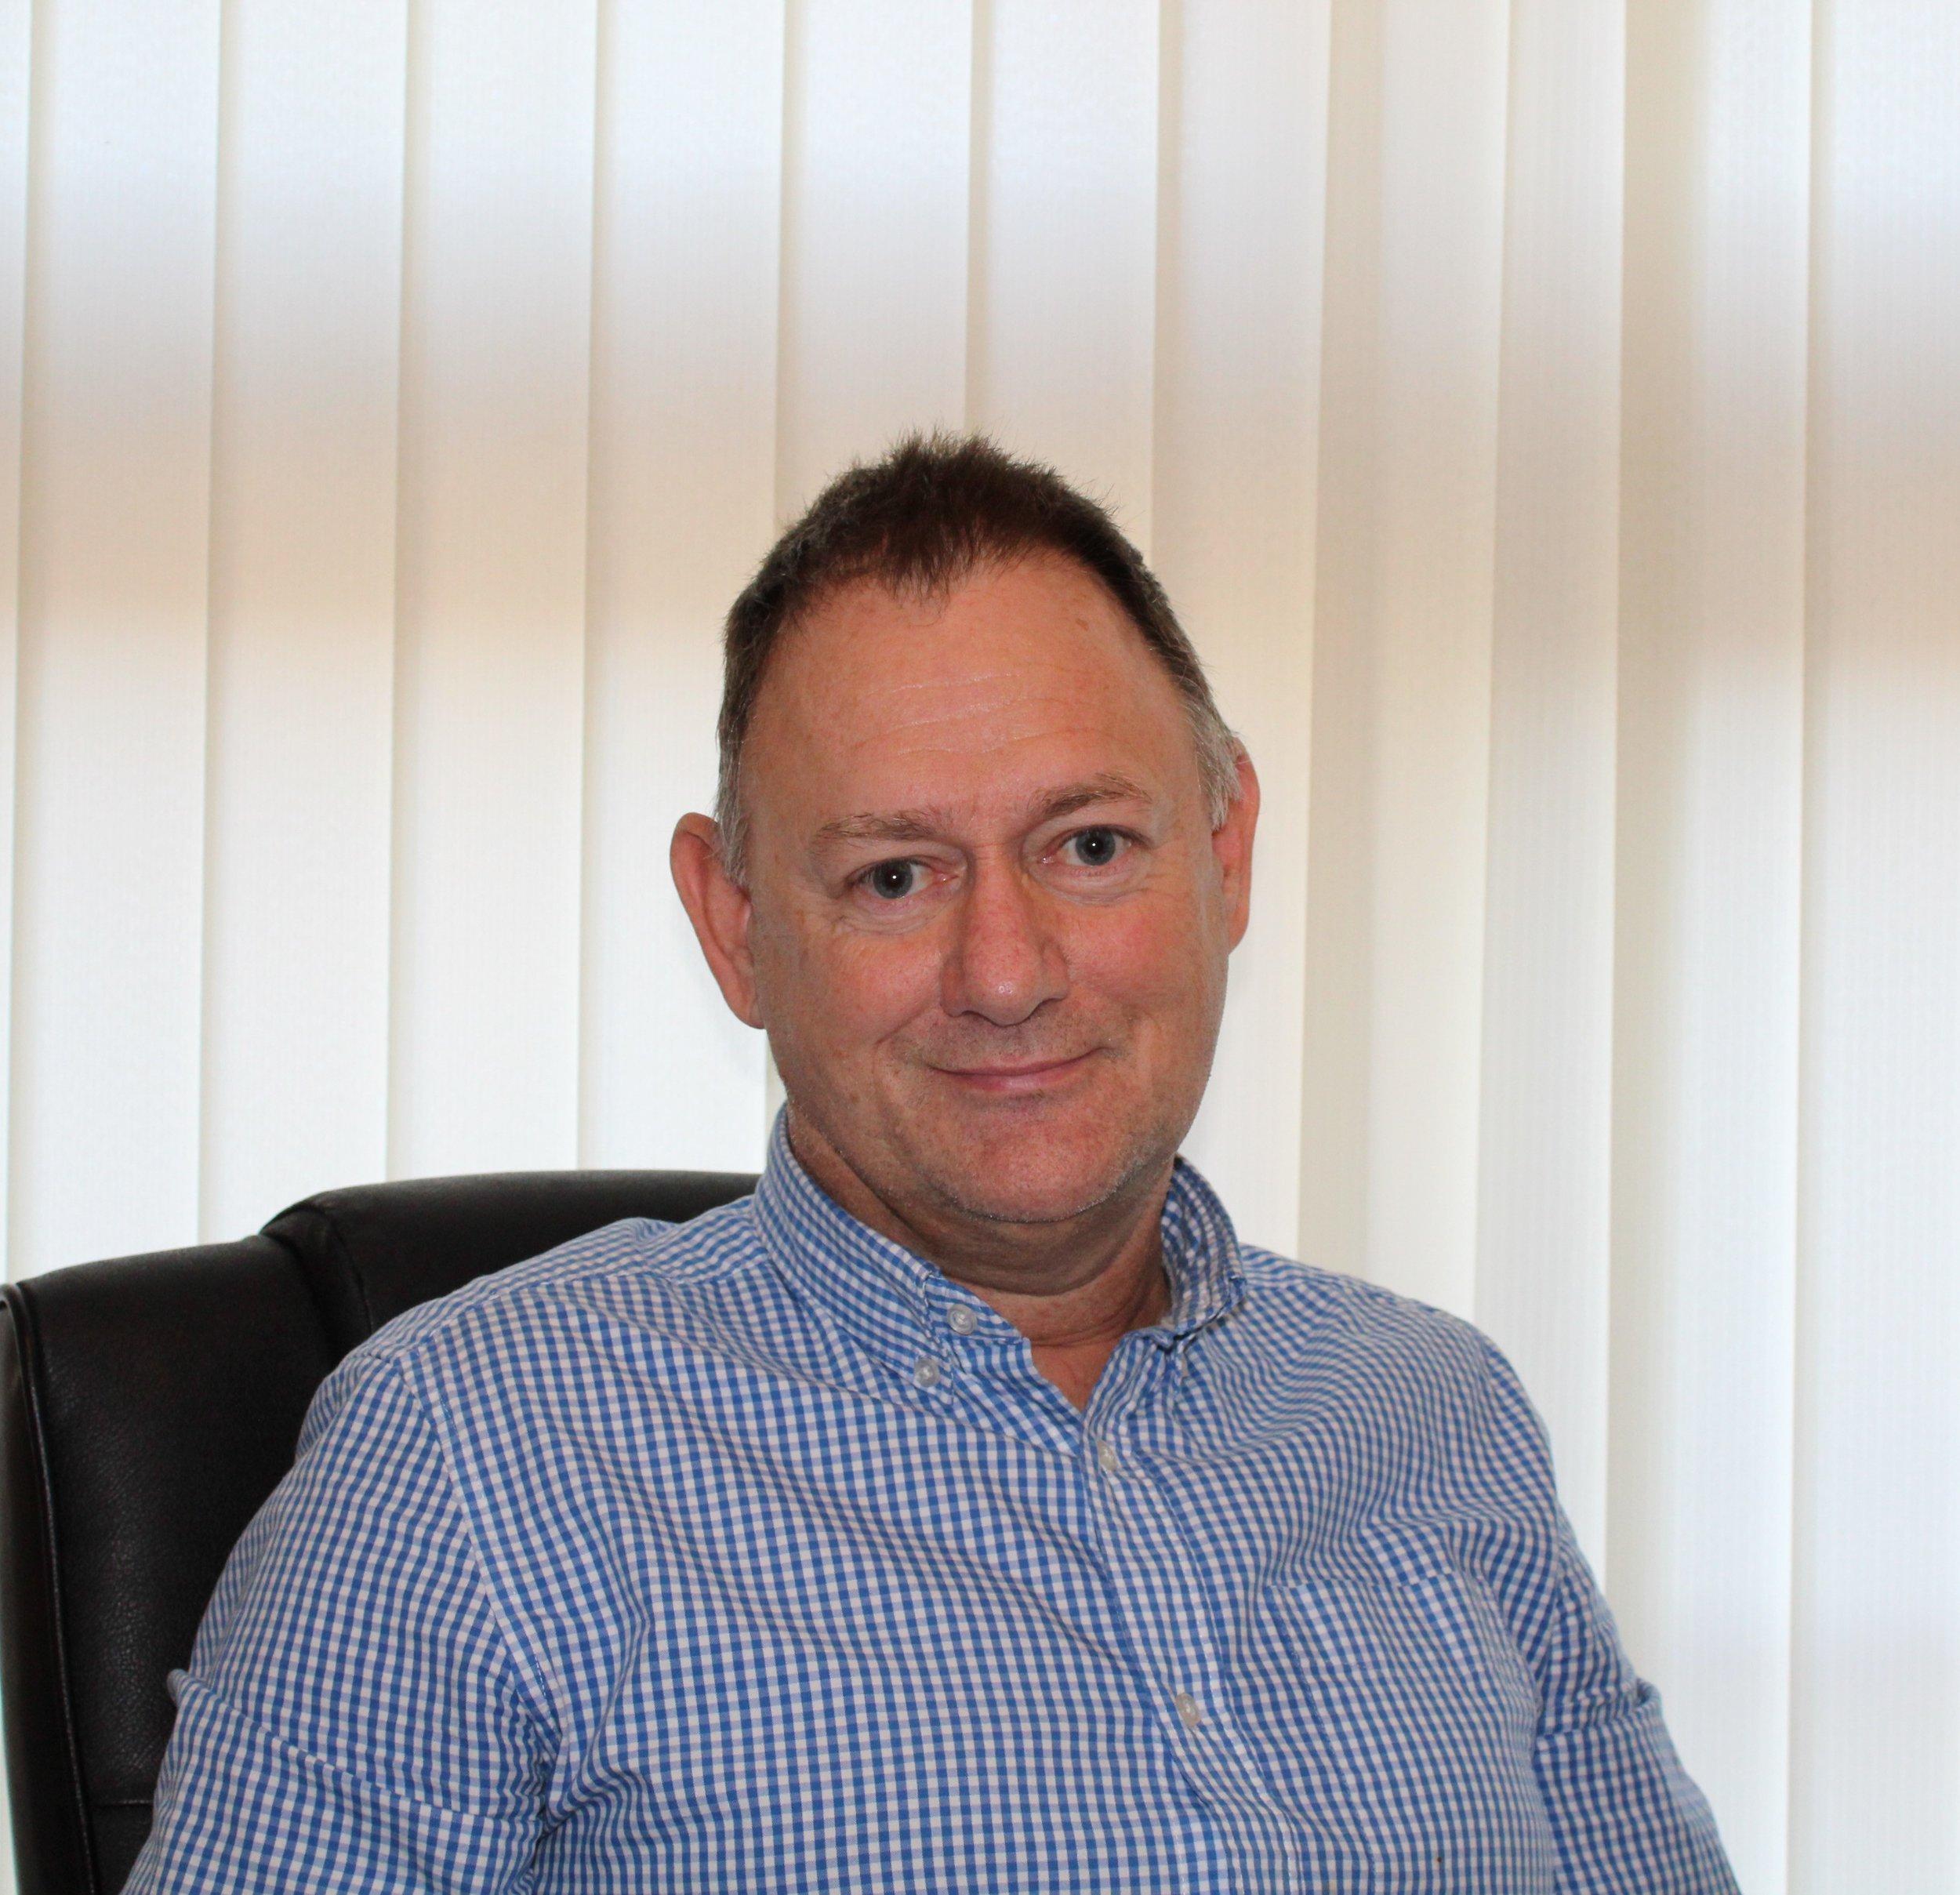 Huw Godsell - Managing Director